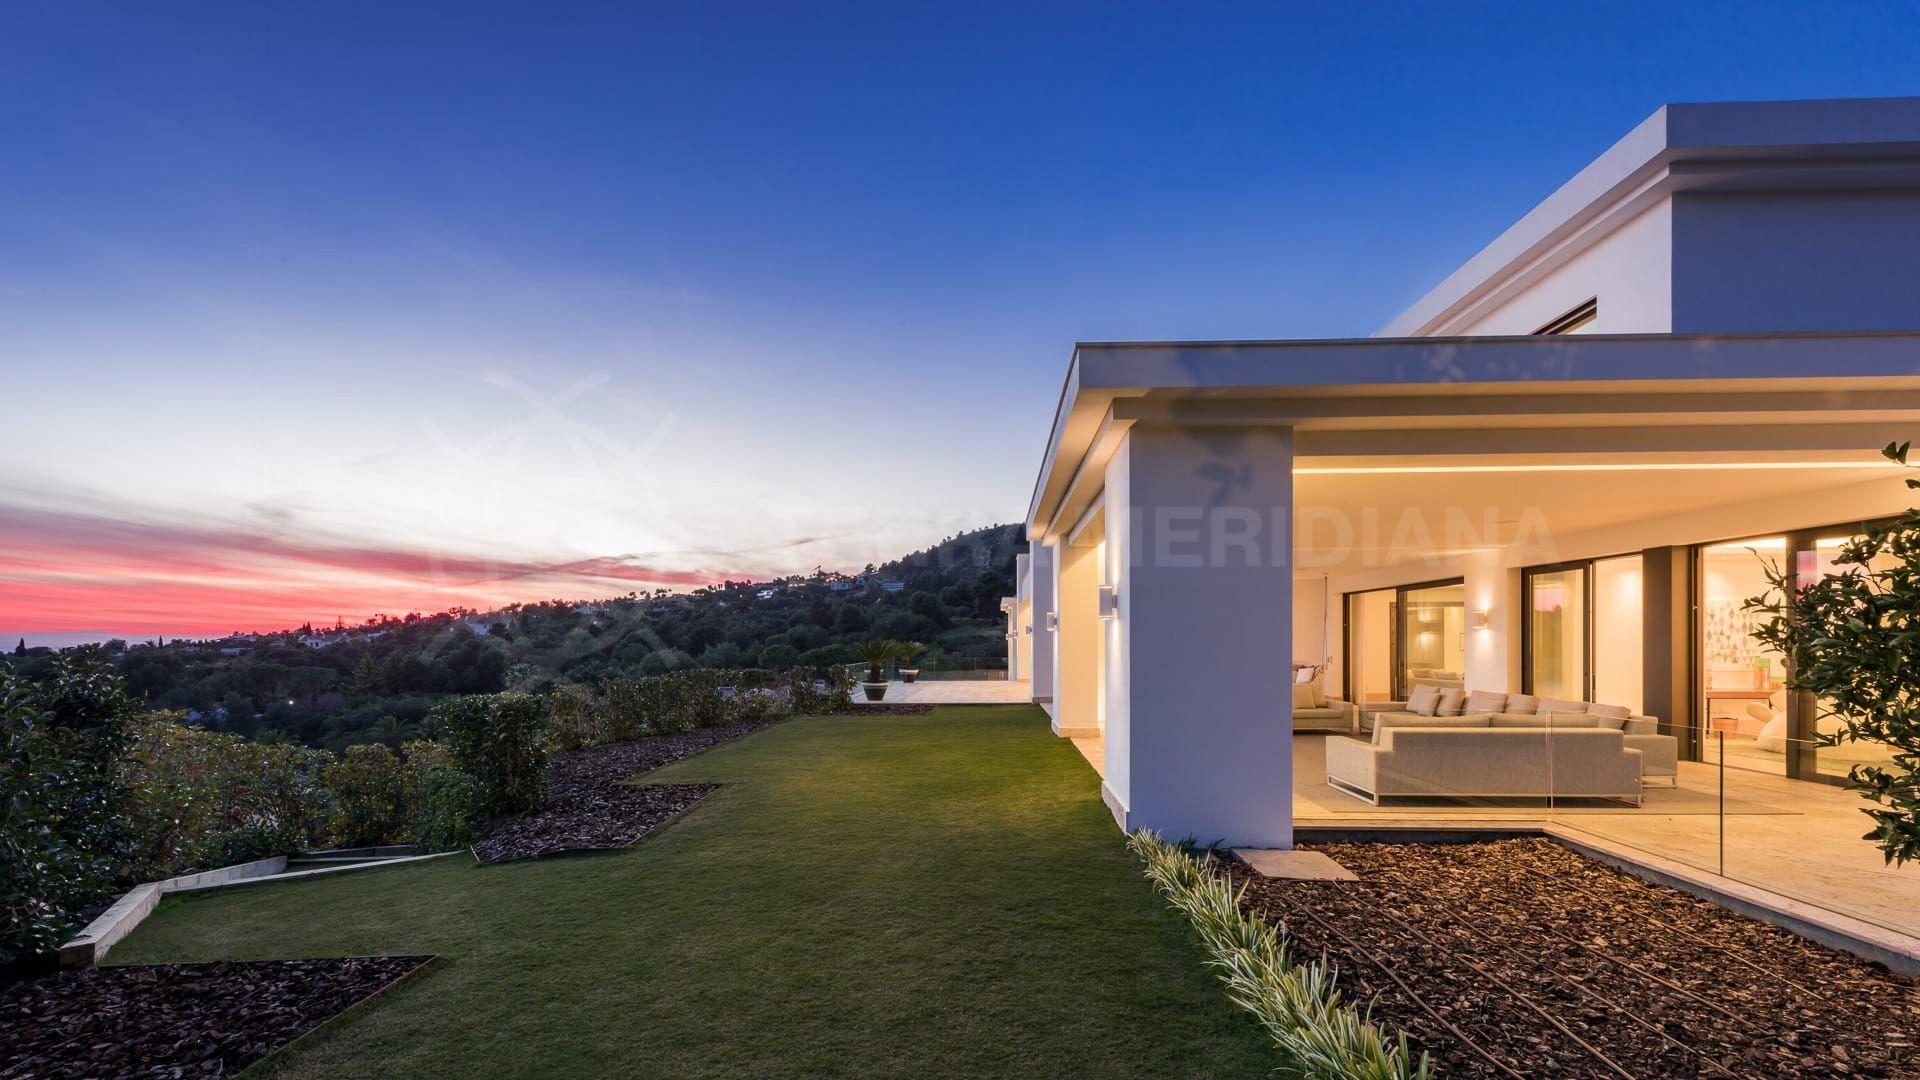 Superb imagery sells luxury villas in Marbella